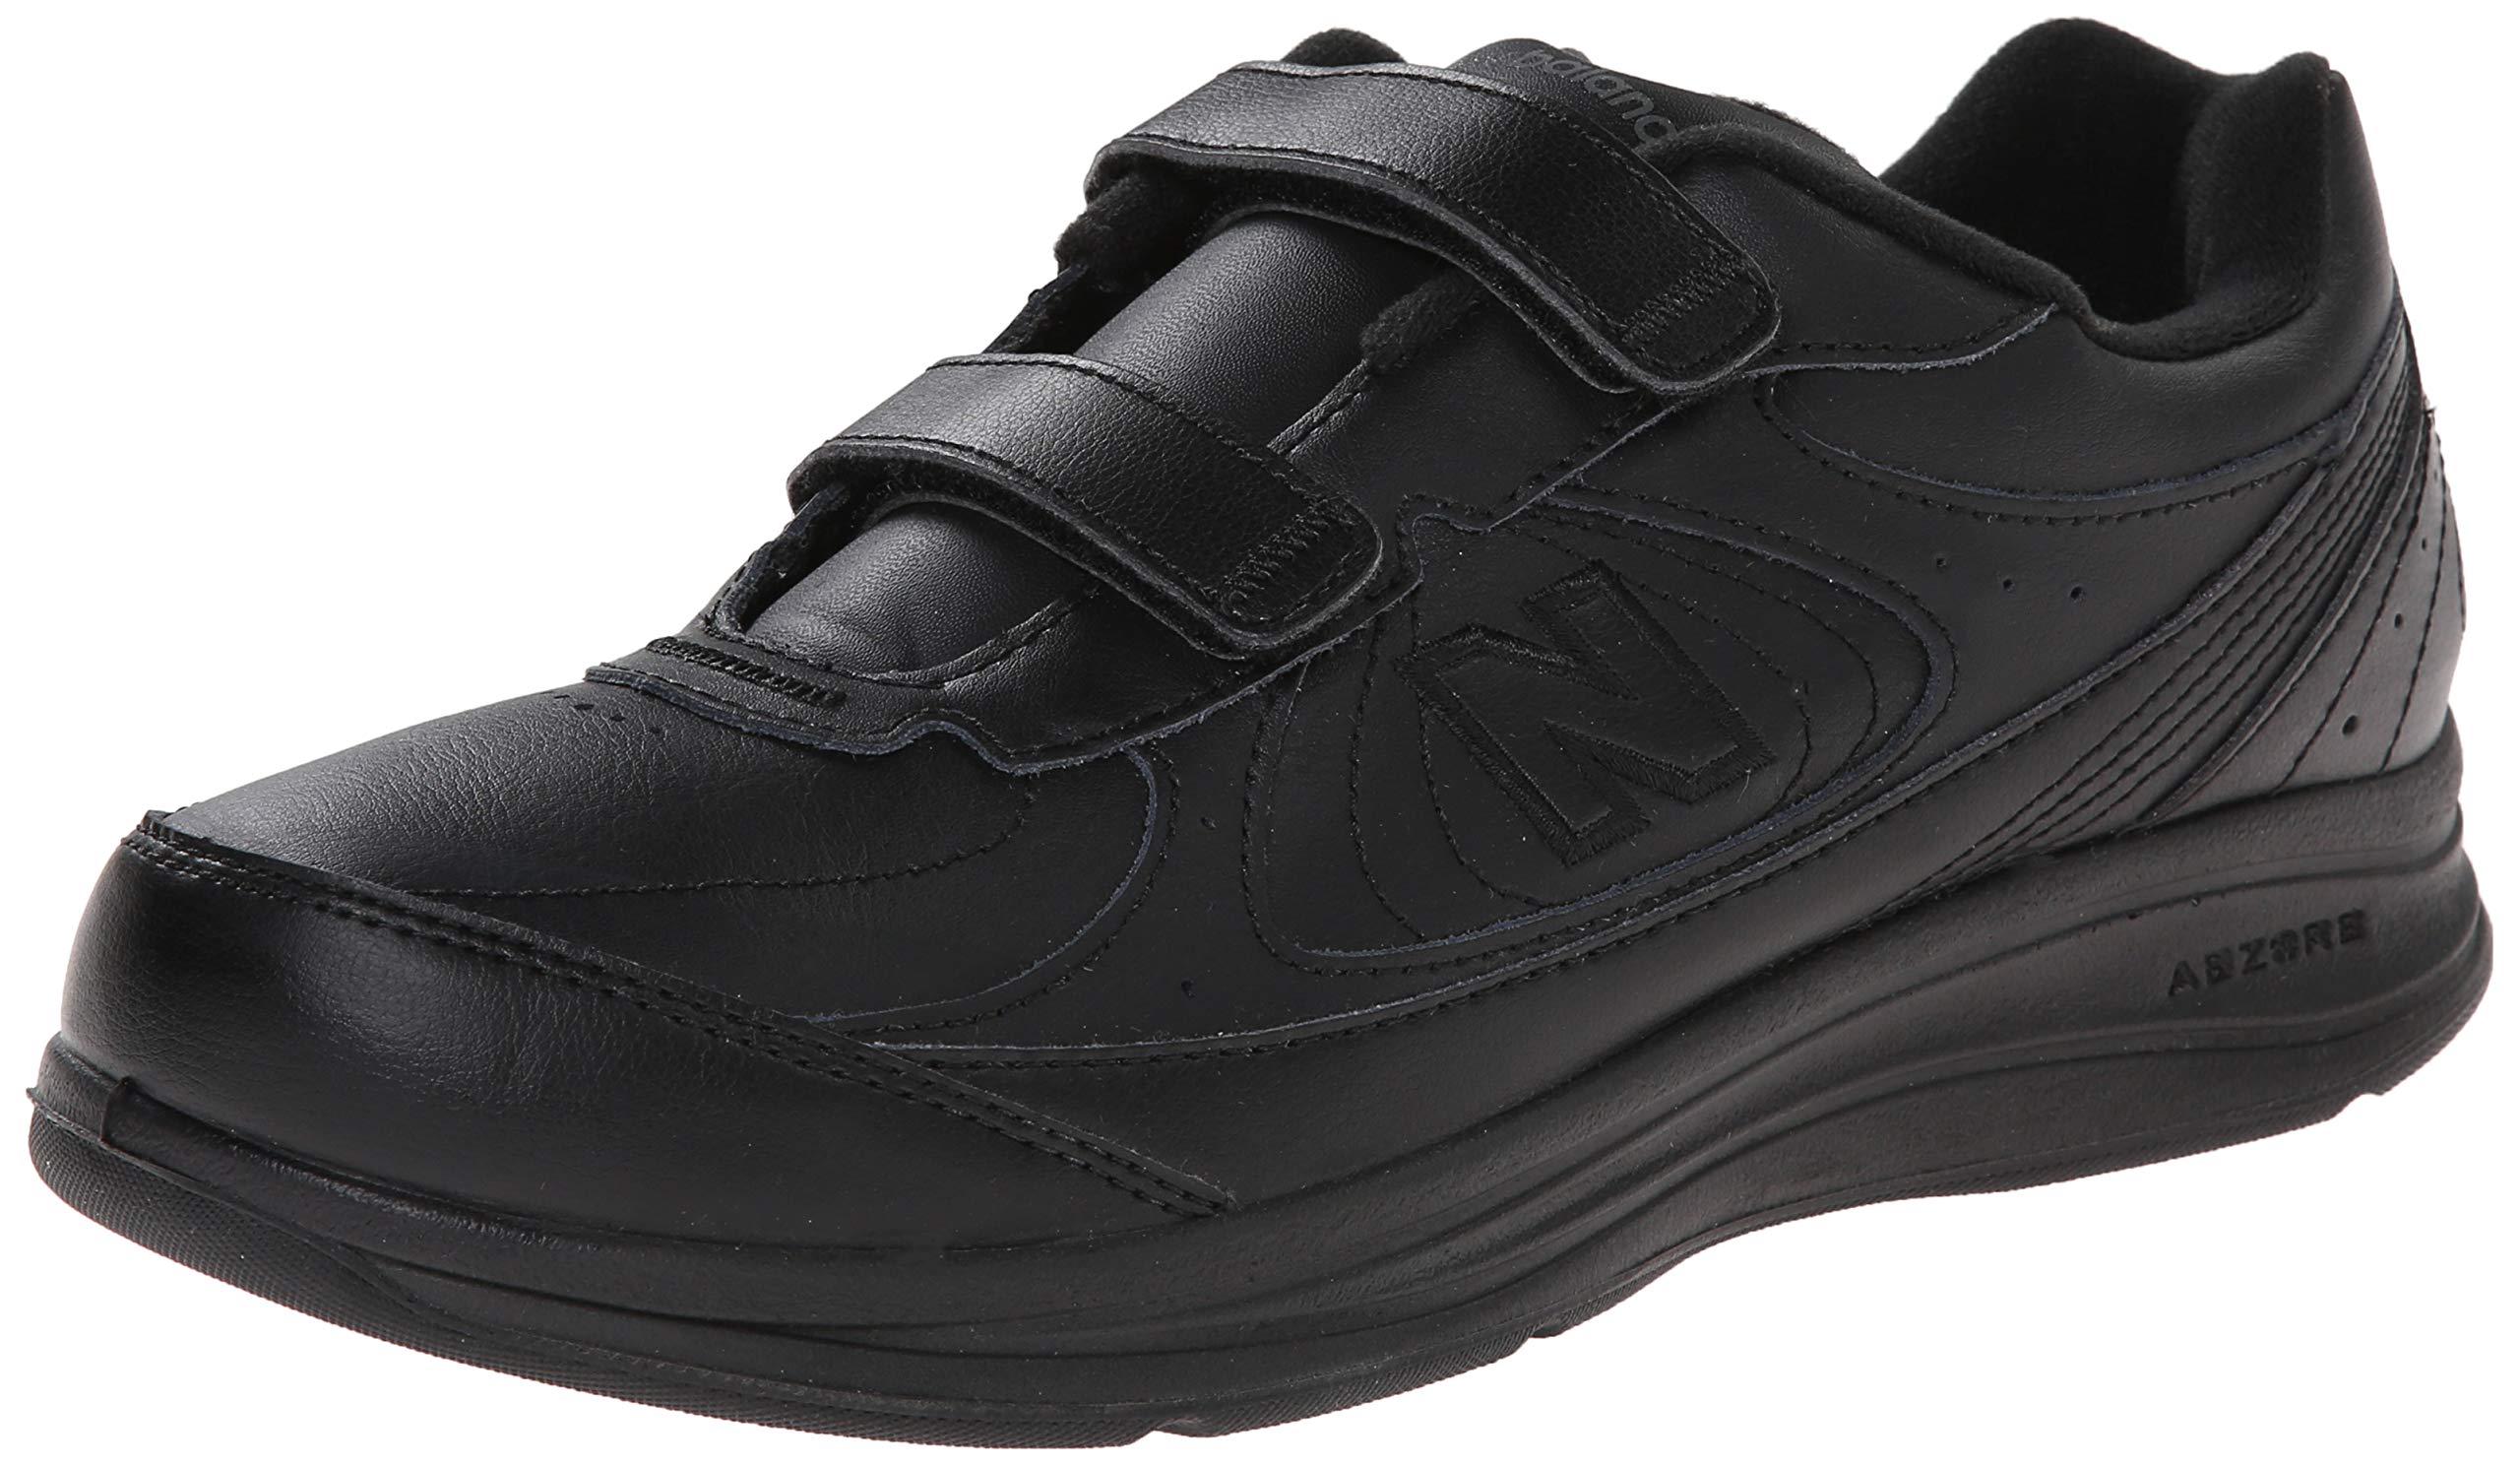 New Balance Men's MW577 Hook and Loop Walking Shoe, Black, 10.5 2E US